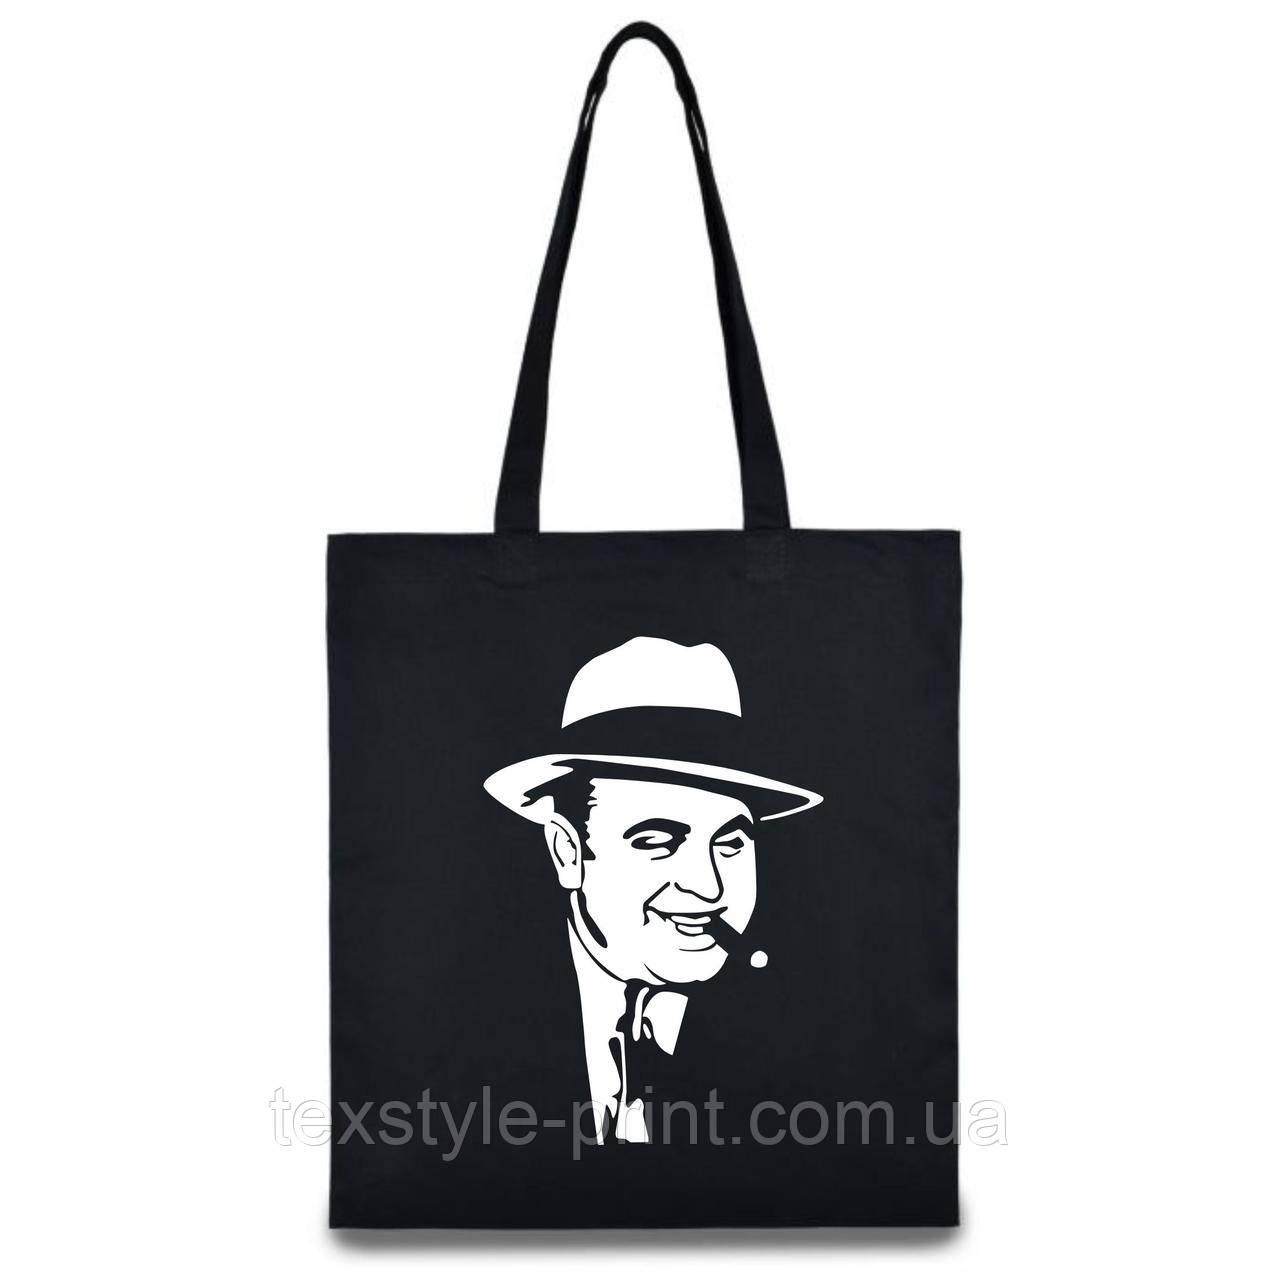 Эко сумка из хлопка. Al Capone